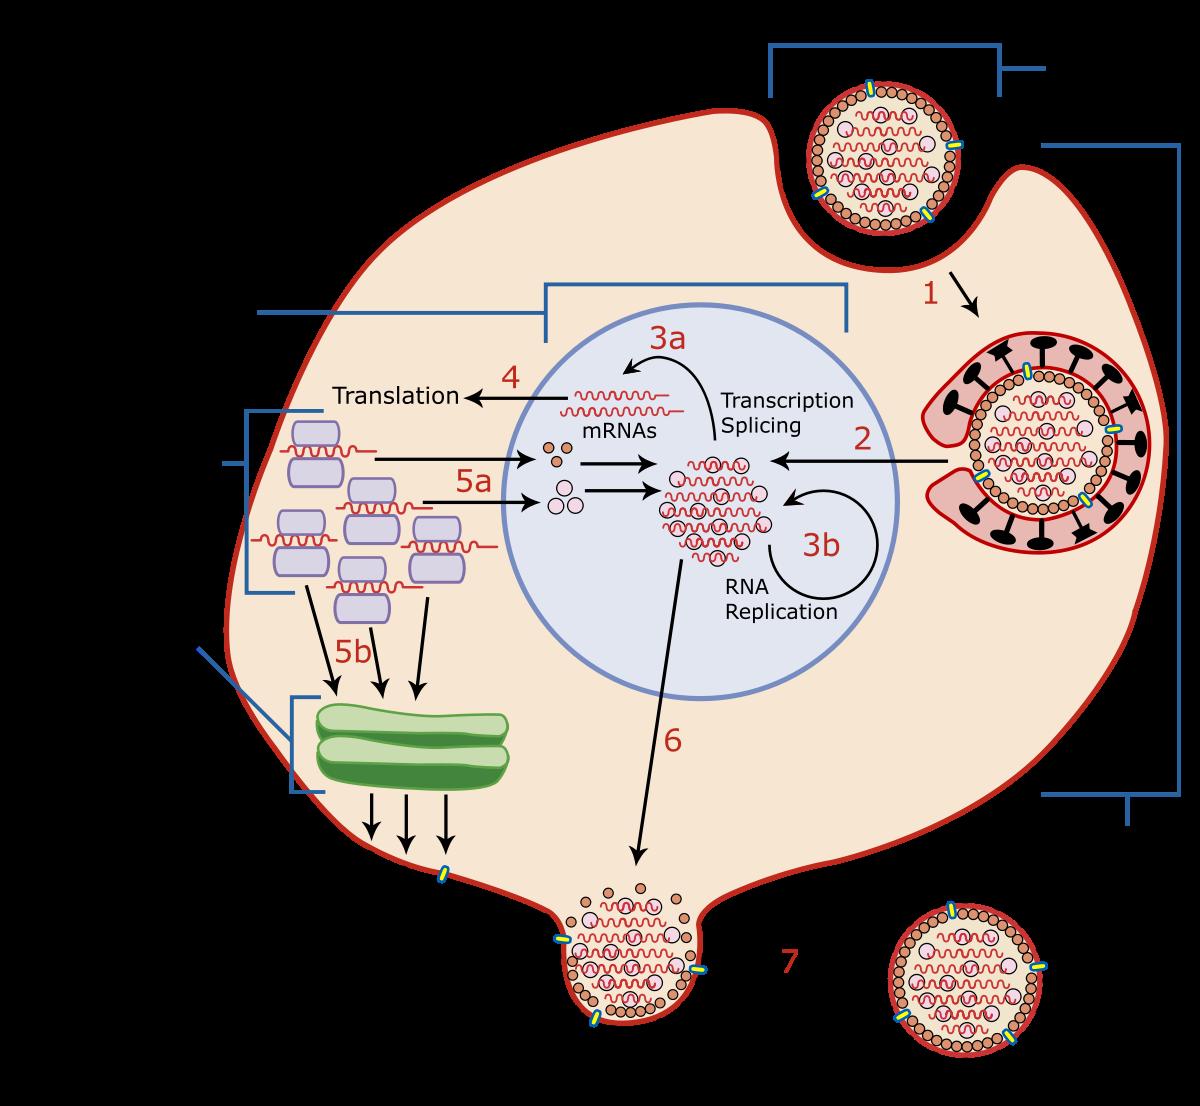 cauze cancer rect schneiderian papilloma inverted